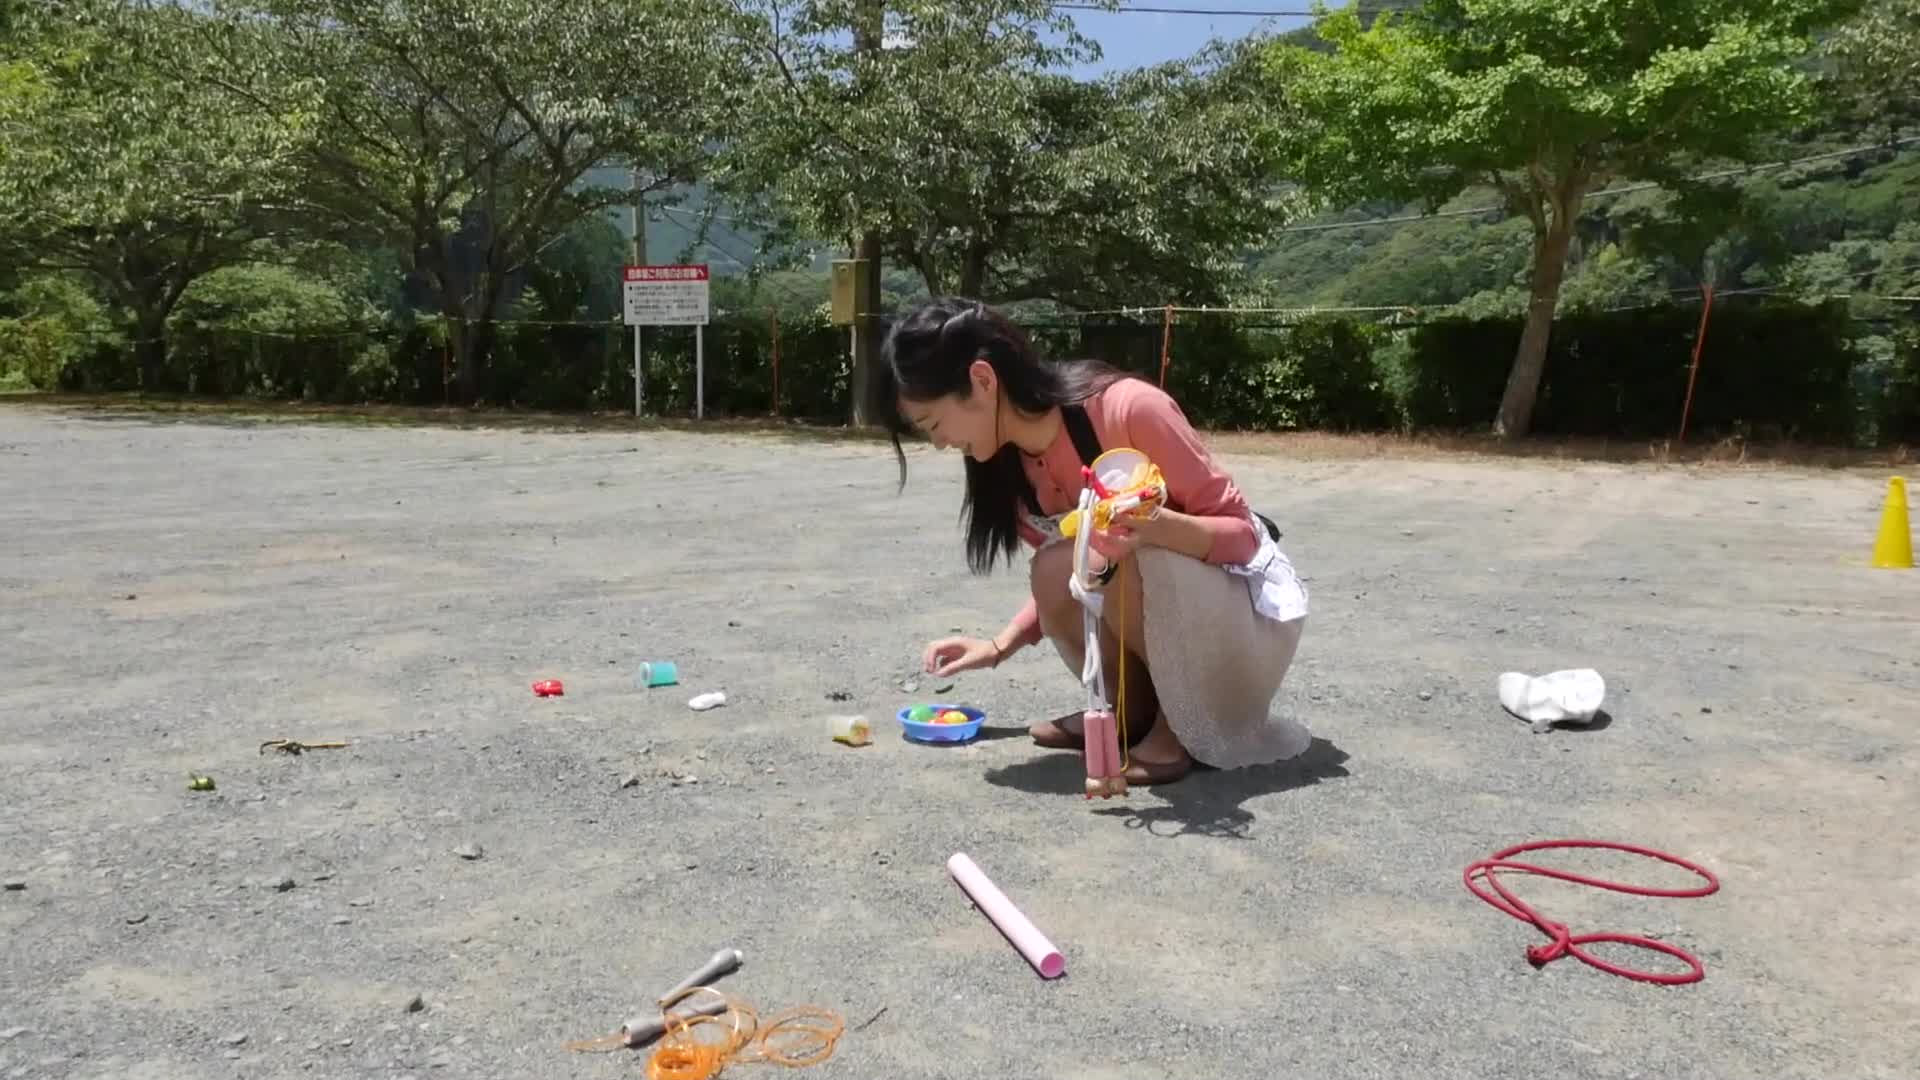 c3 - みすど 魅惑の透明感/宮脇麻那